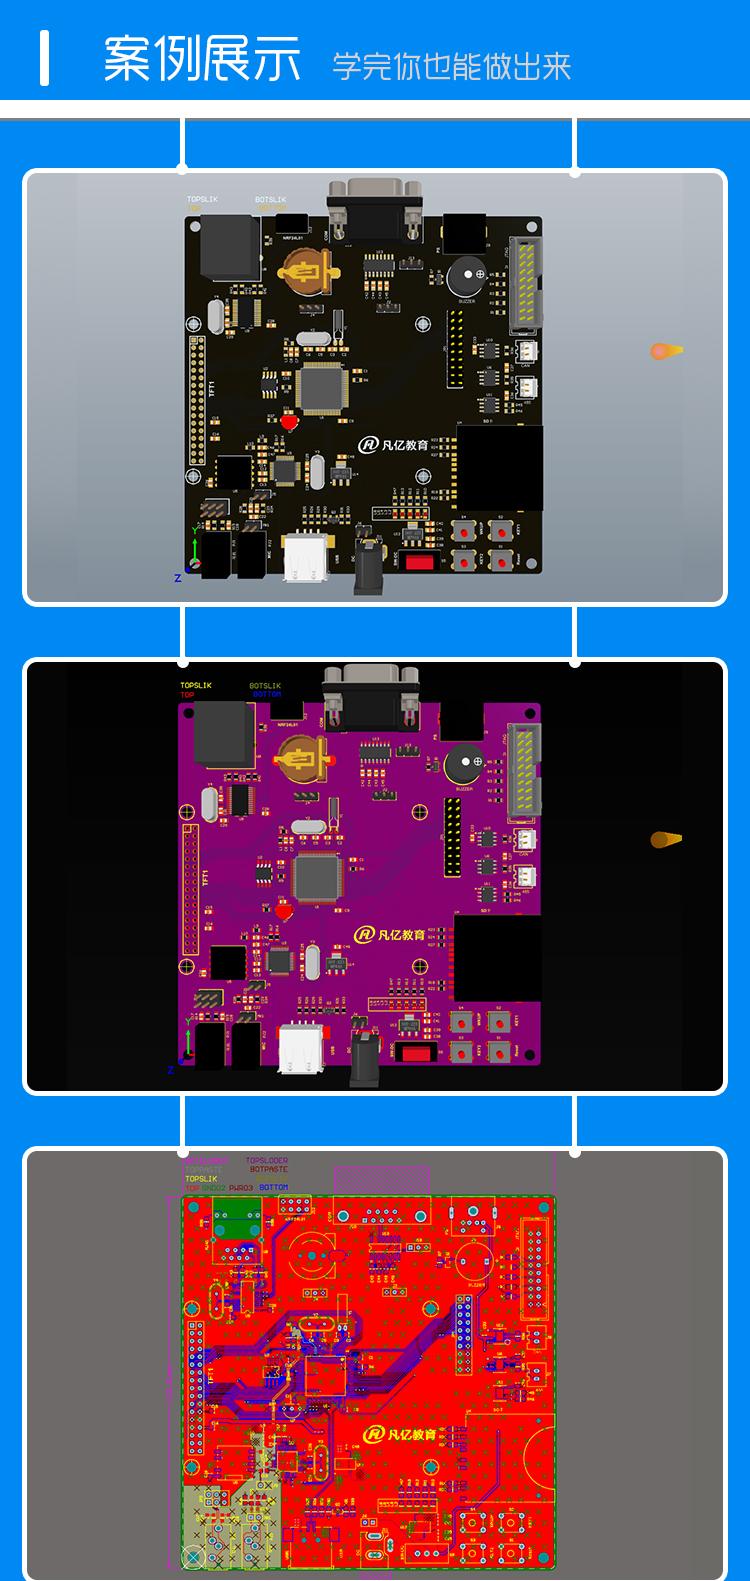 Altium19 4層SMT32主板實戰視頻2.jpg